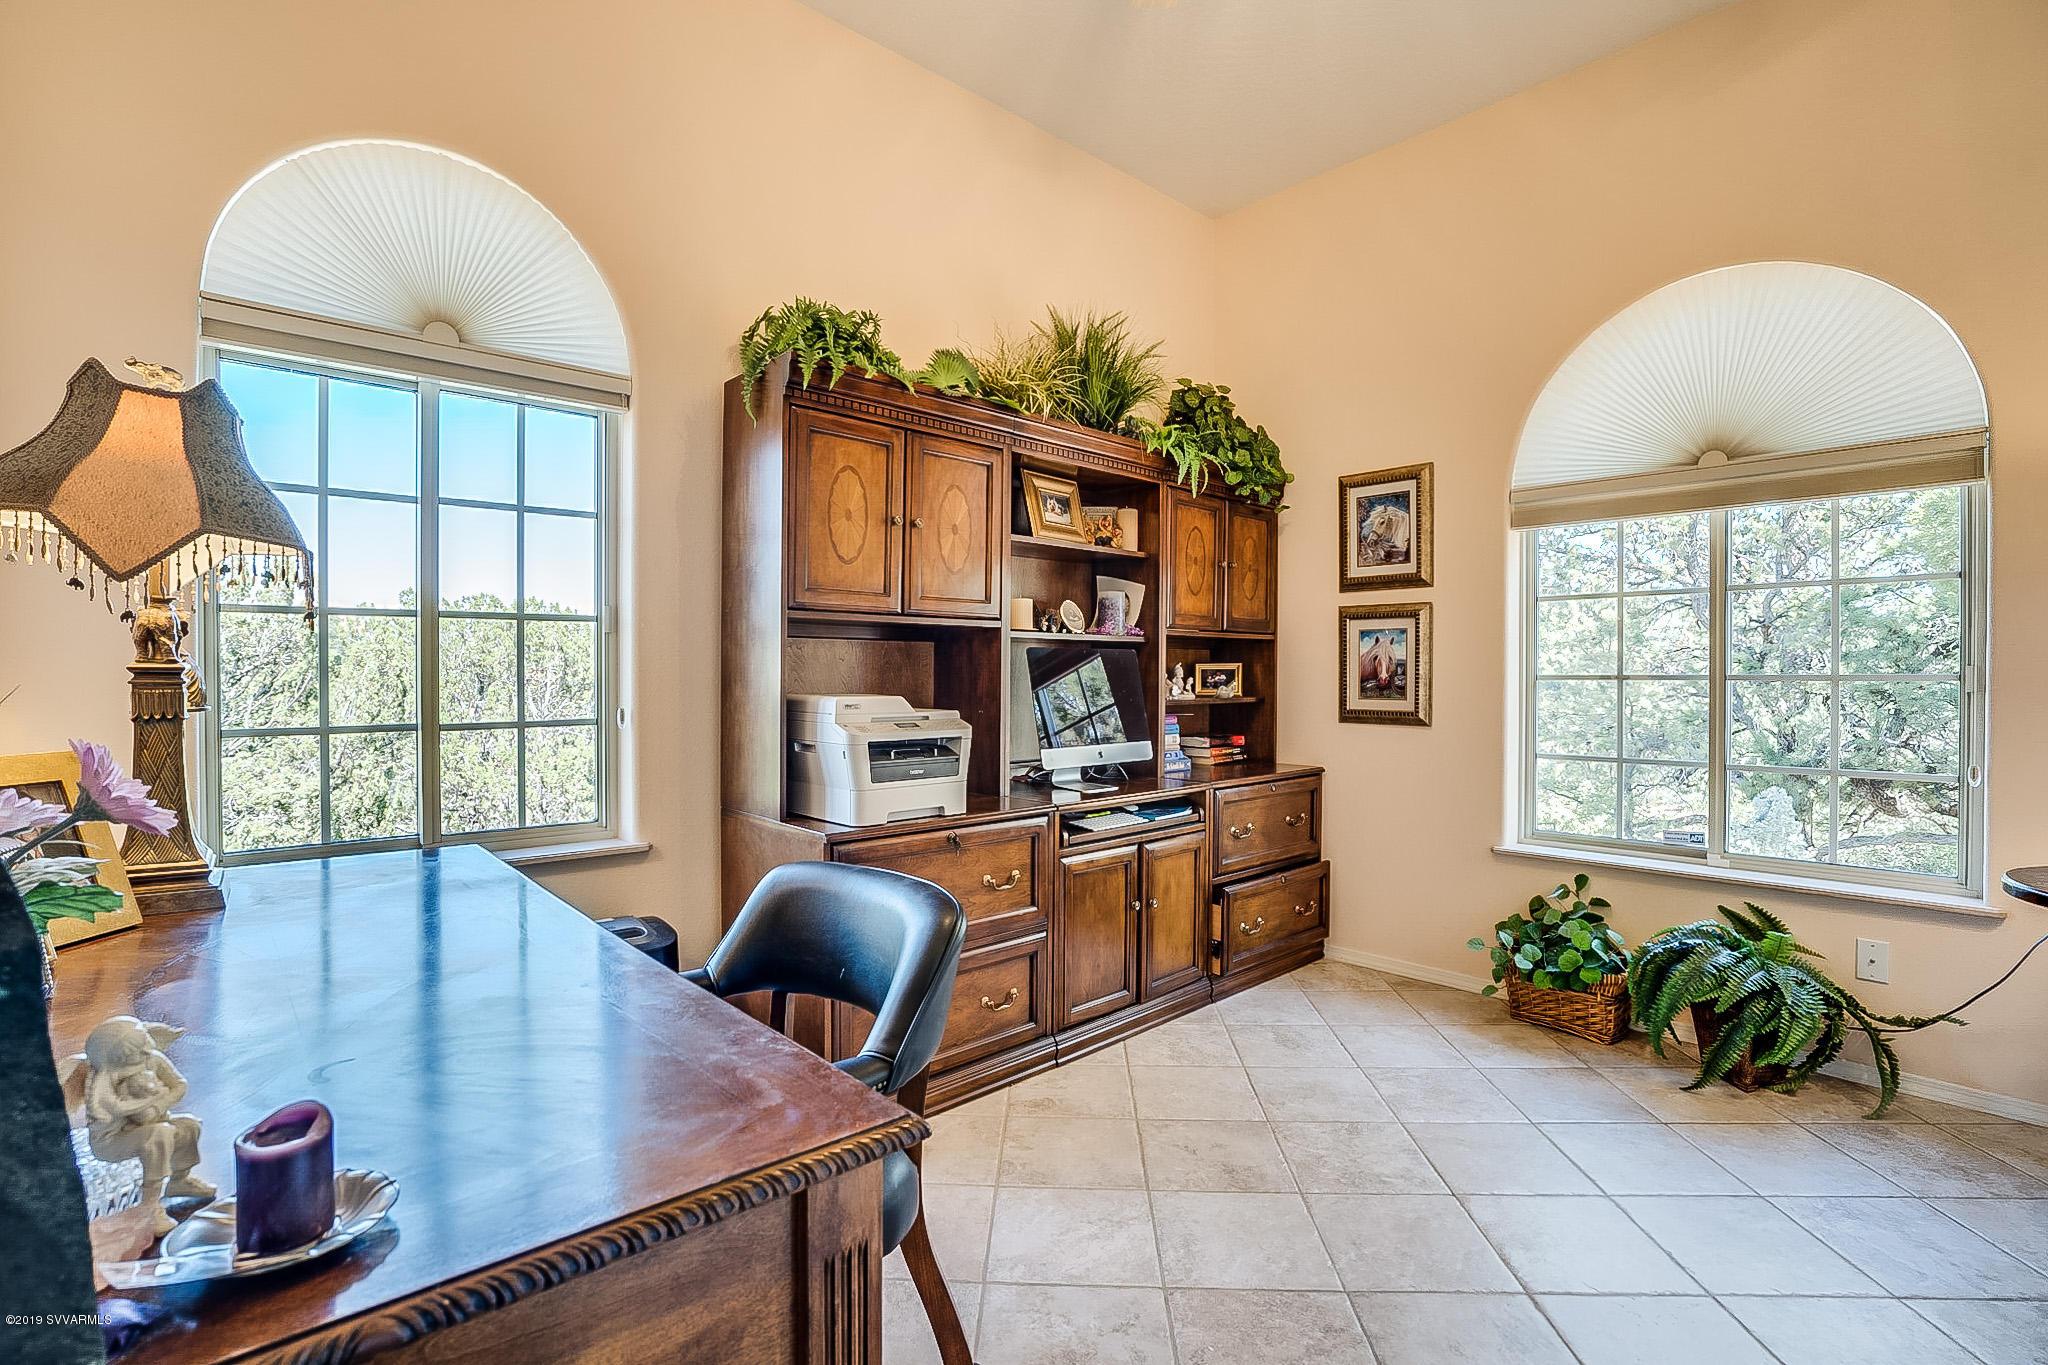 185 Bristlecone Pines Rd Sedona, AZ 86336